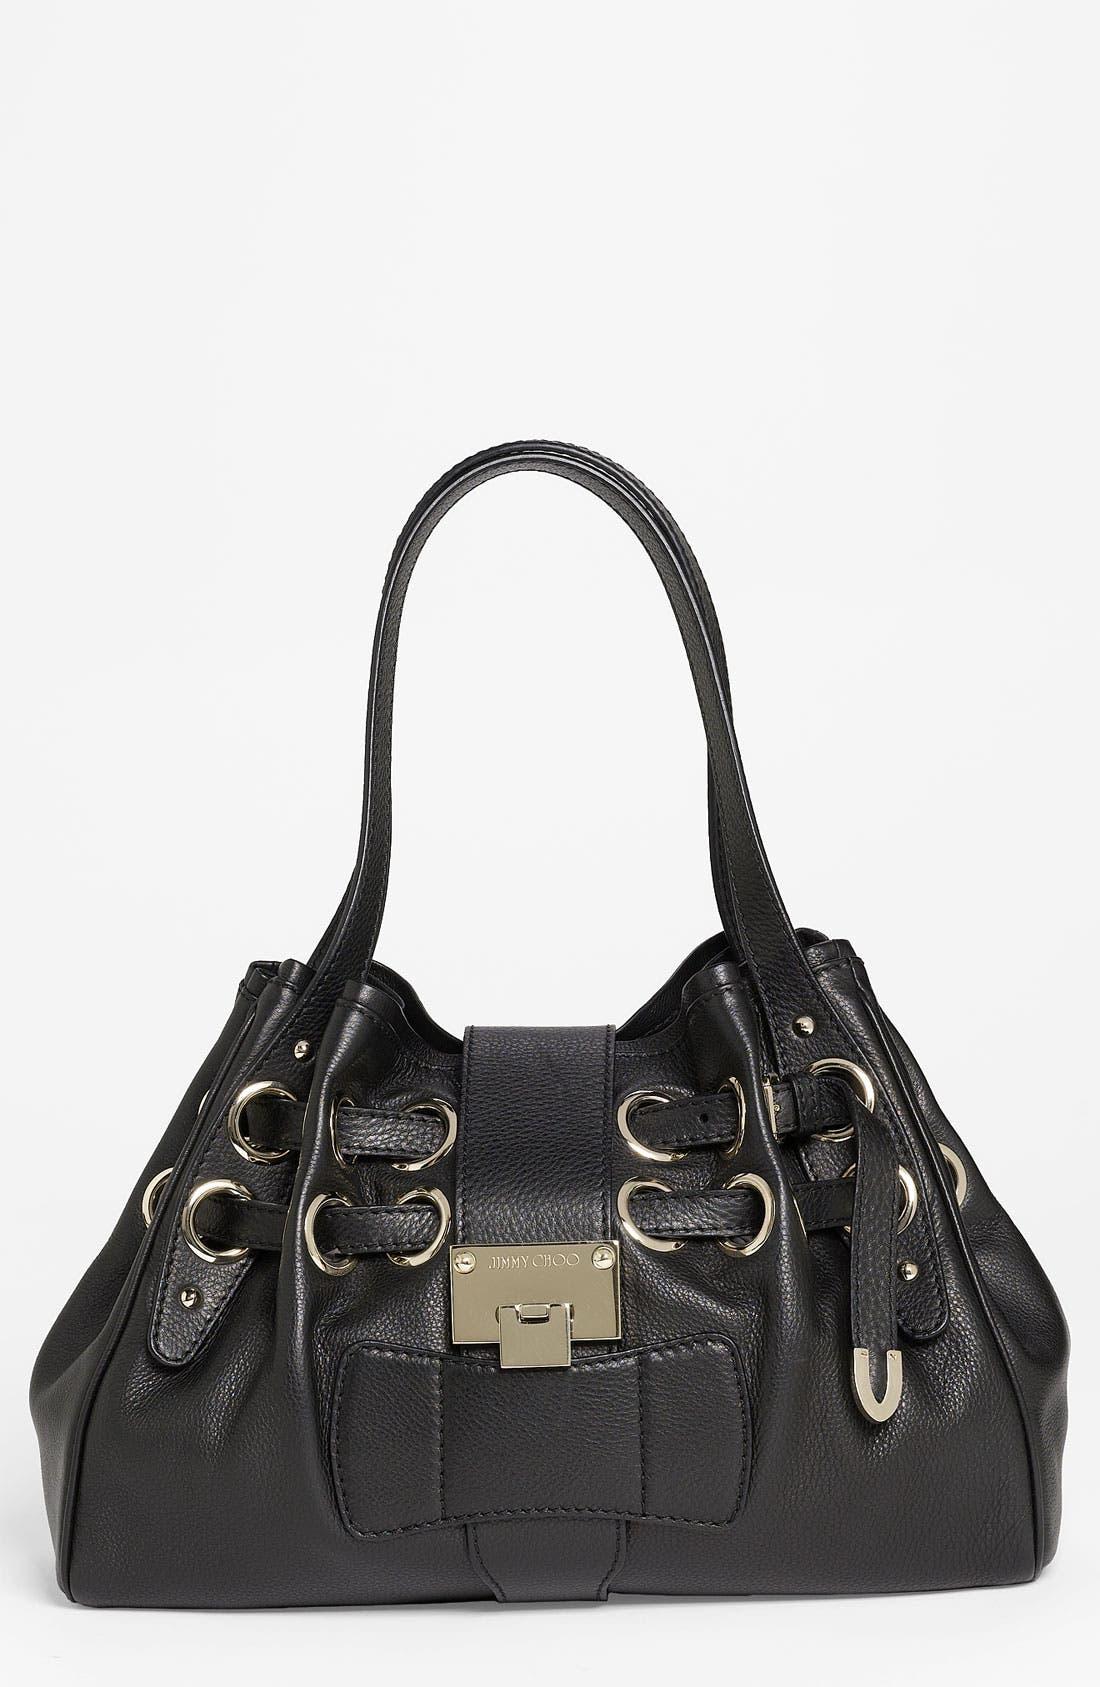 Main Image - Jimmy Choo 'Riki' Leather Shopper